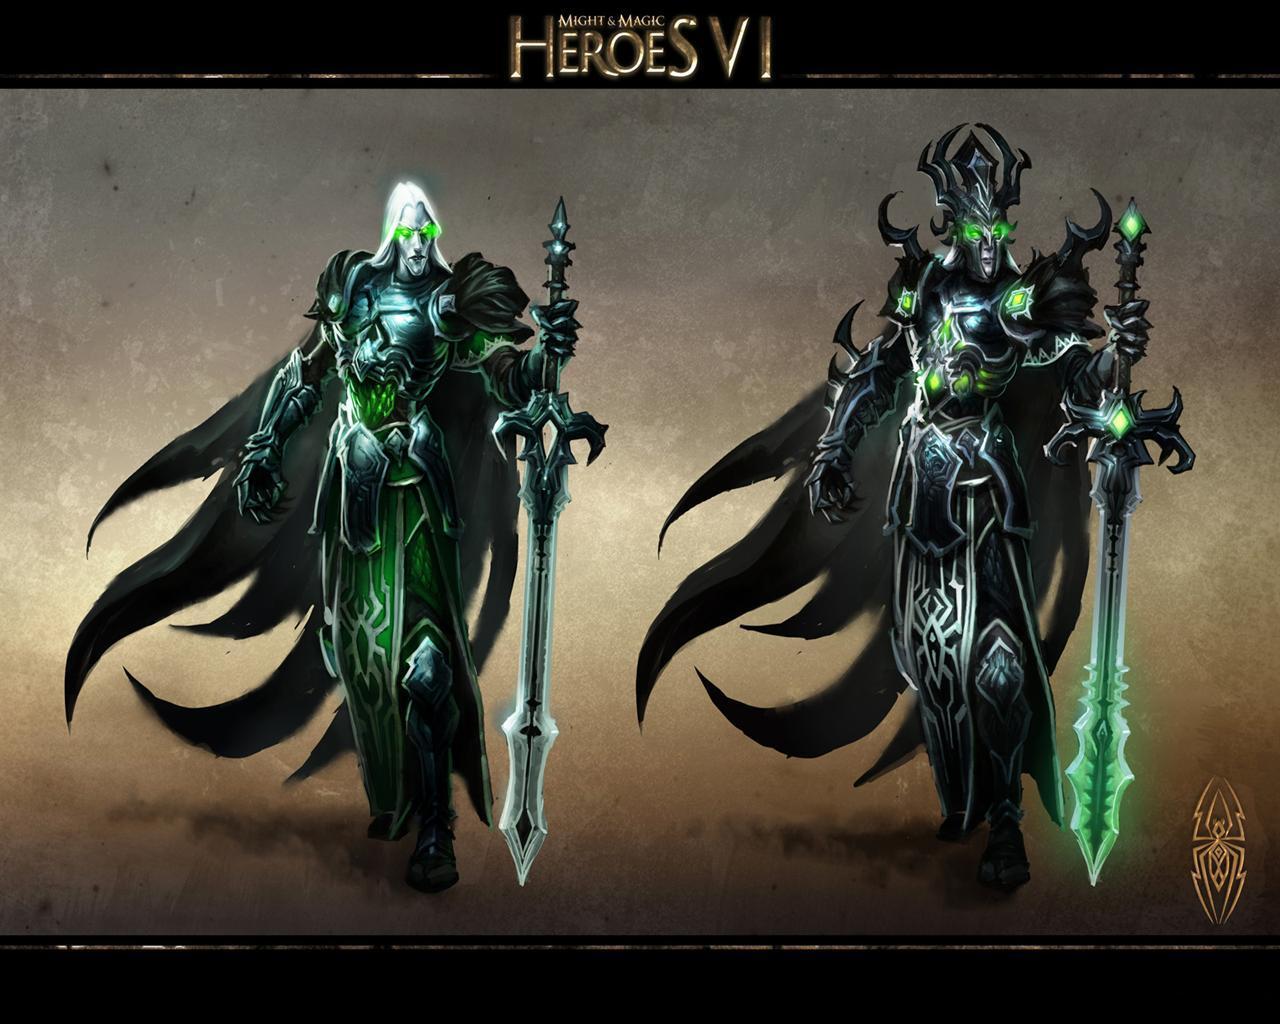 Купить Might and Magic Heroes VI + гаран месяц